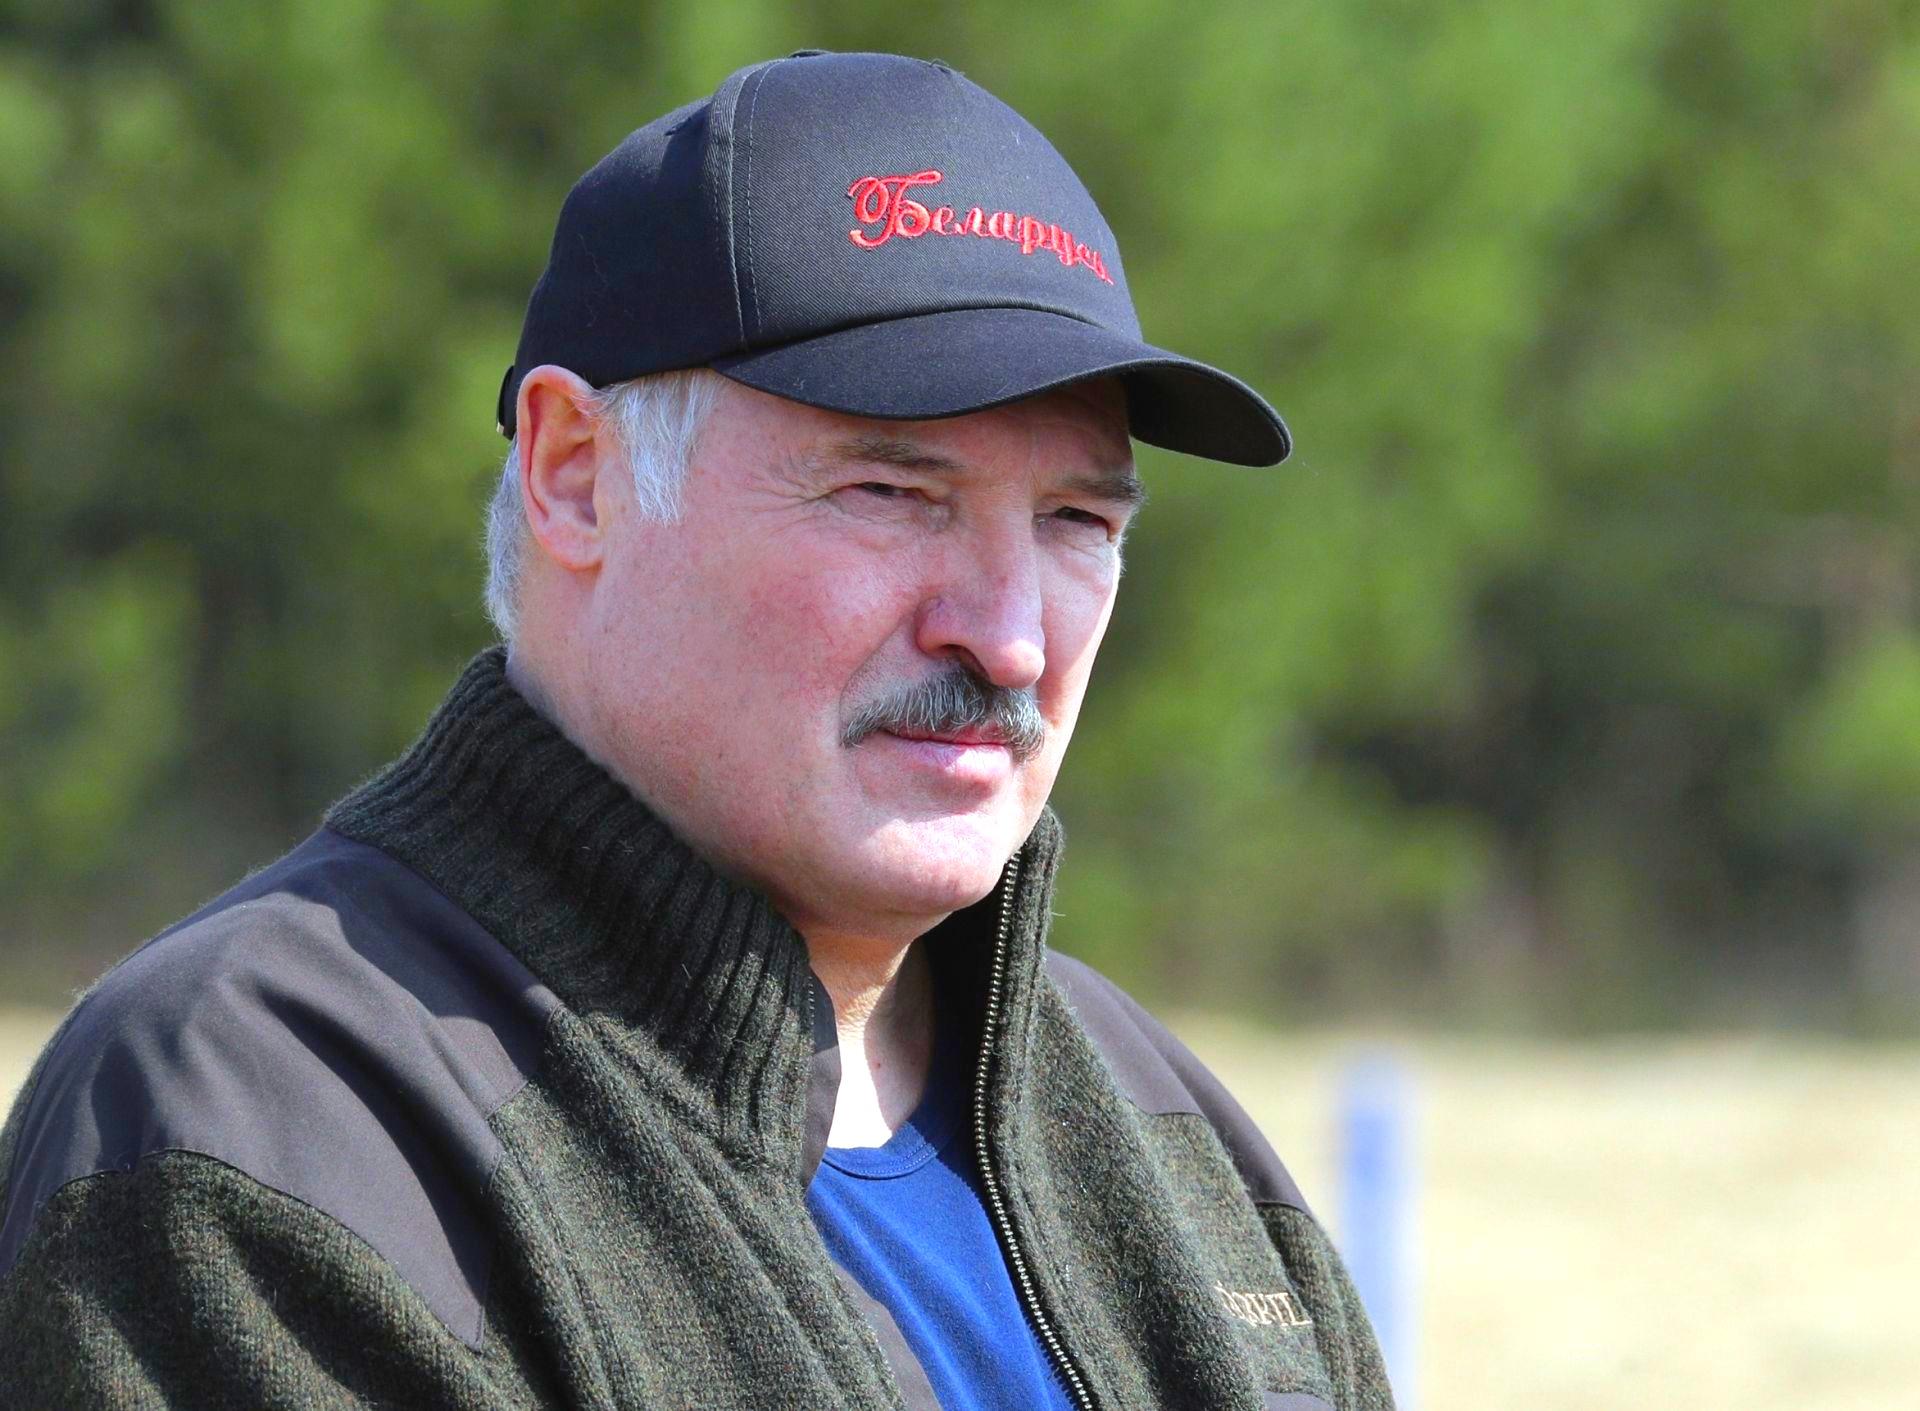 Засидевшийся на двух стульях Лукашенко оказался не нужен ни России, ни США Александр Лукашенко,Беларусь,Владимир Путин,Политика,Европа,Россия,США